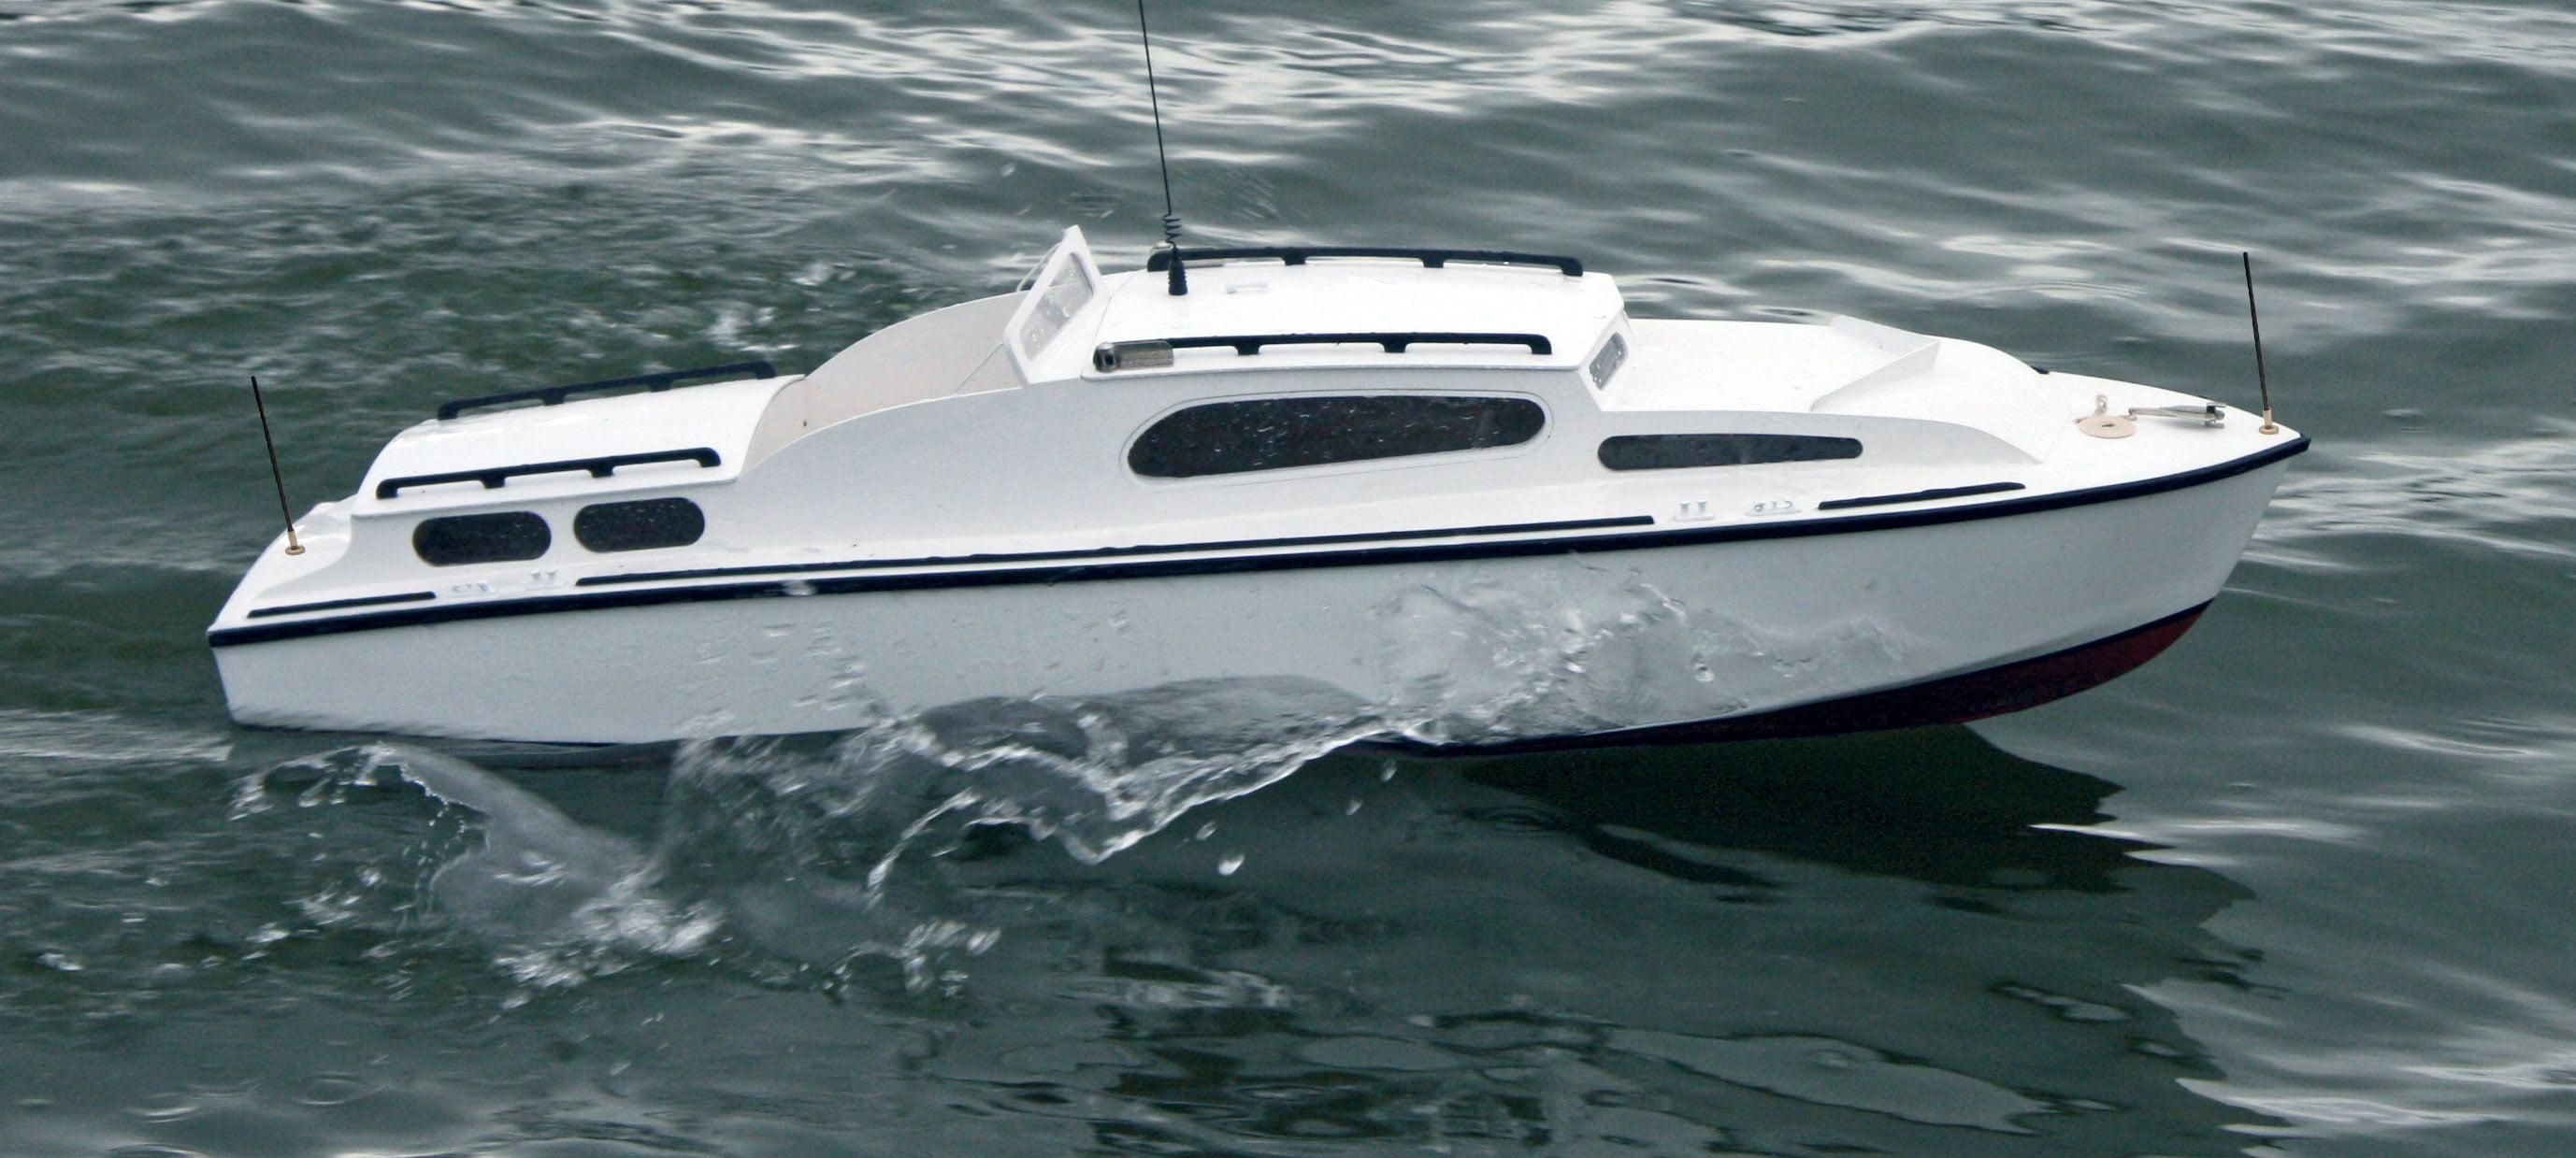 Aerokits Sea Commander 34  Cabin Cruiser Kit | Hobbies